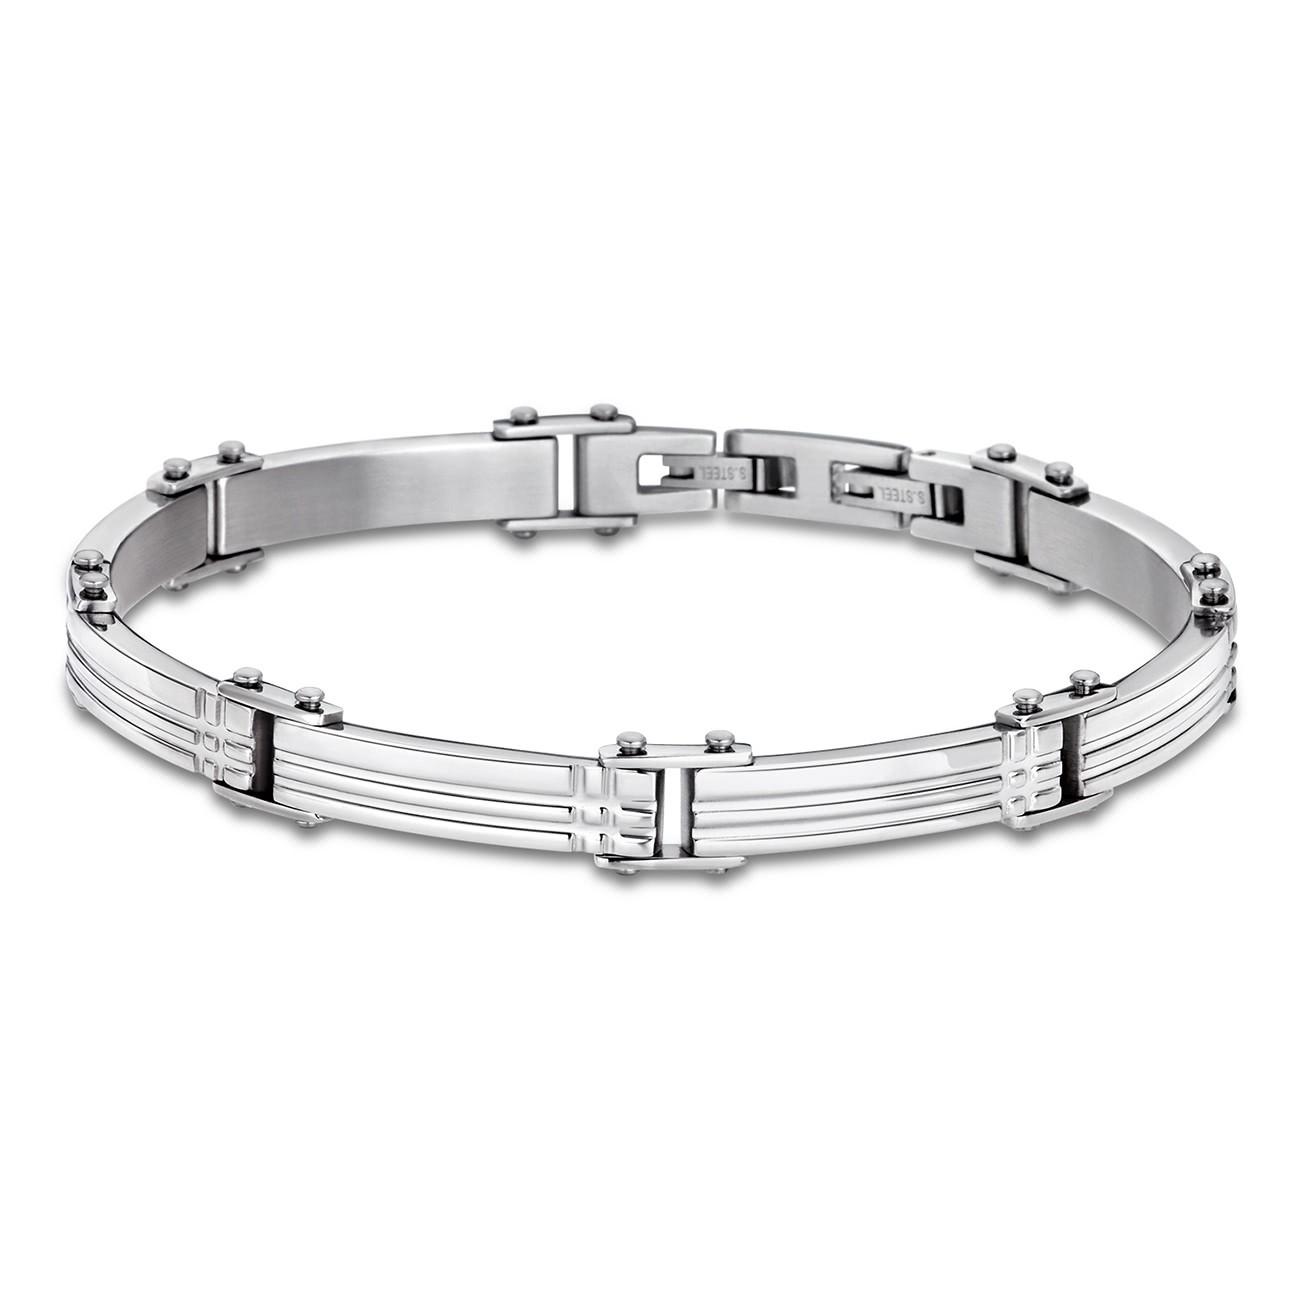 LOTUS Style Armband Herren Edelstahl silber LS1801-2/1 Schmuck JLS1801-2-1